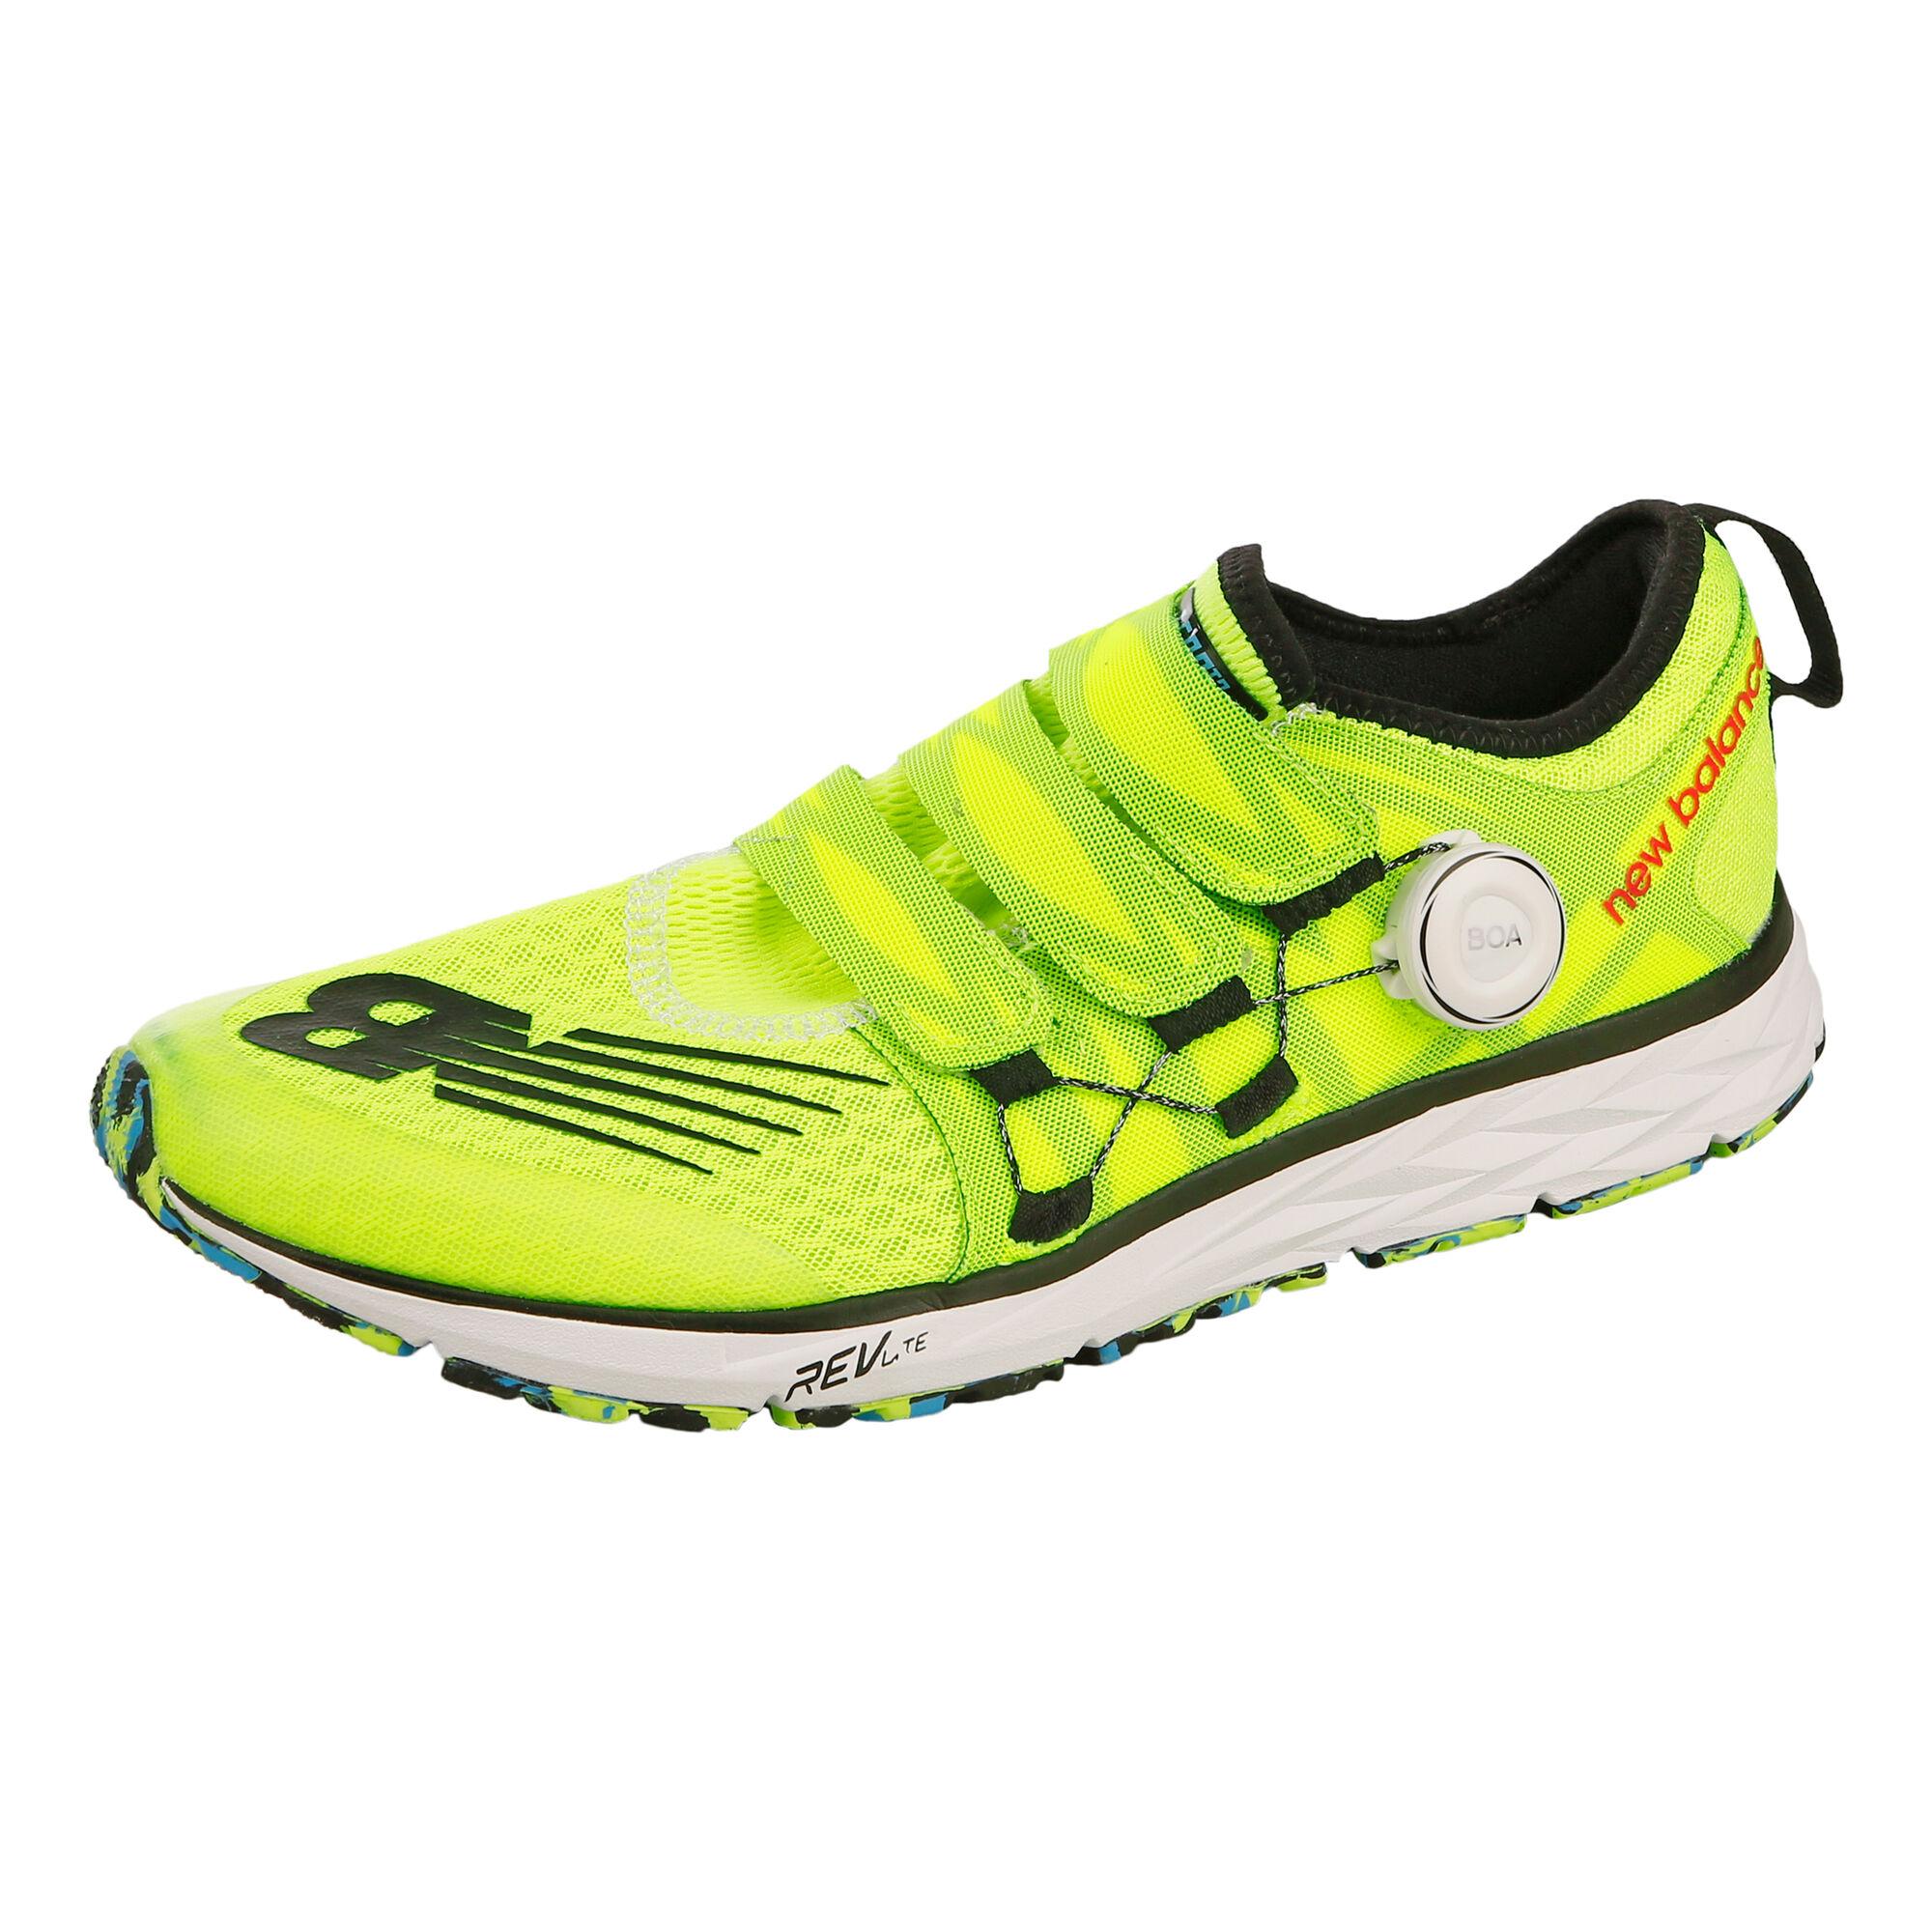 buy popular e2502 1e641 New Balance Race 1500 V4 BOA Competition Running Shoe Men